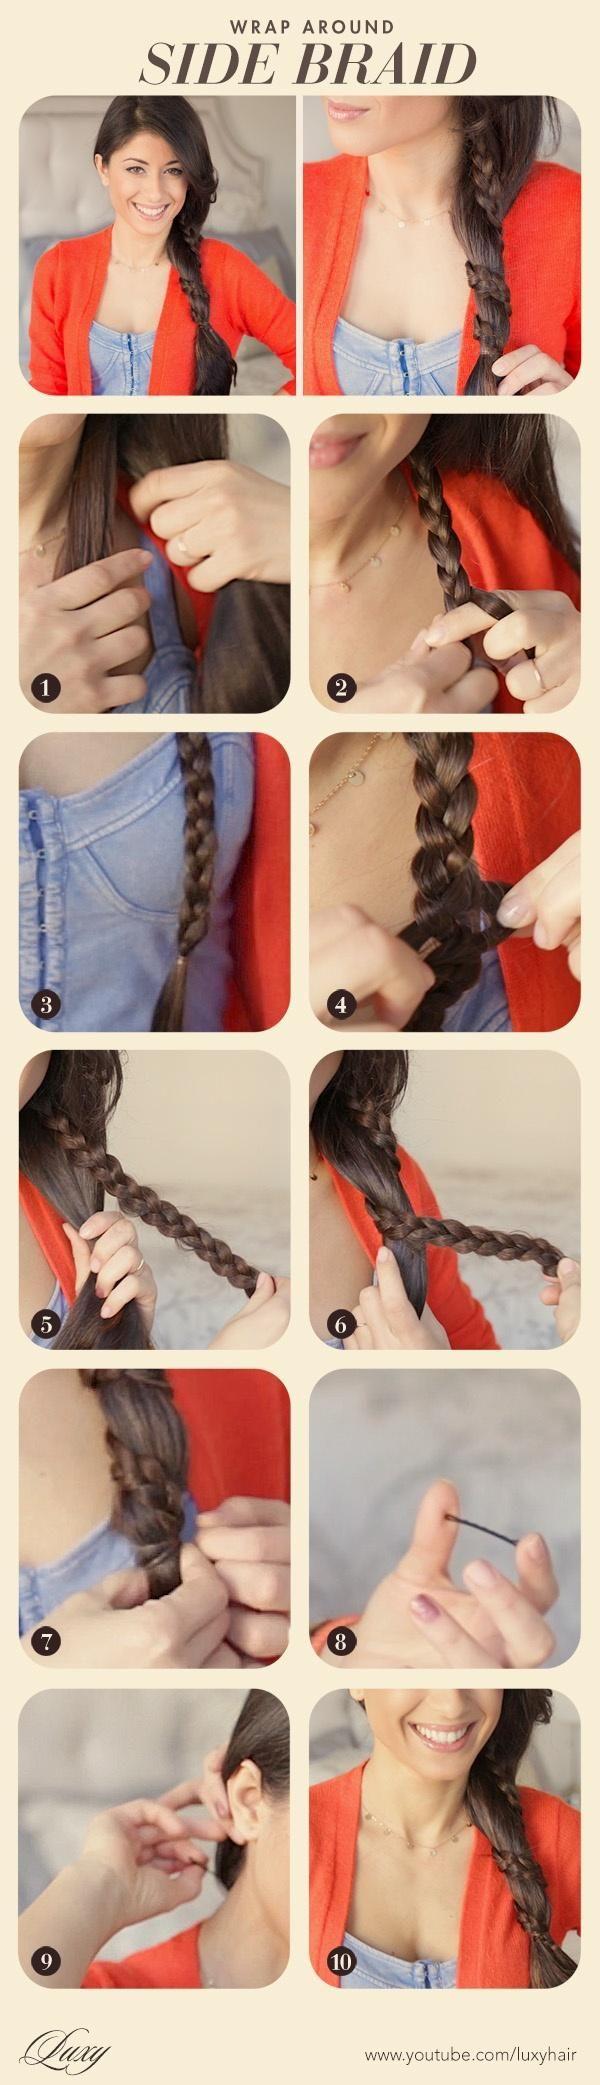 Diy braid saifou images wanna try it pinterest funky braids